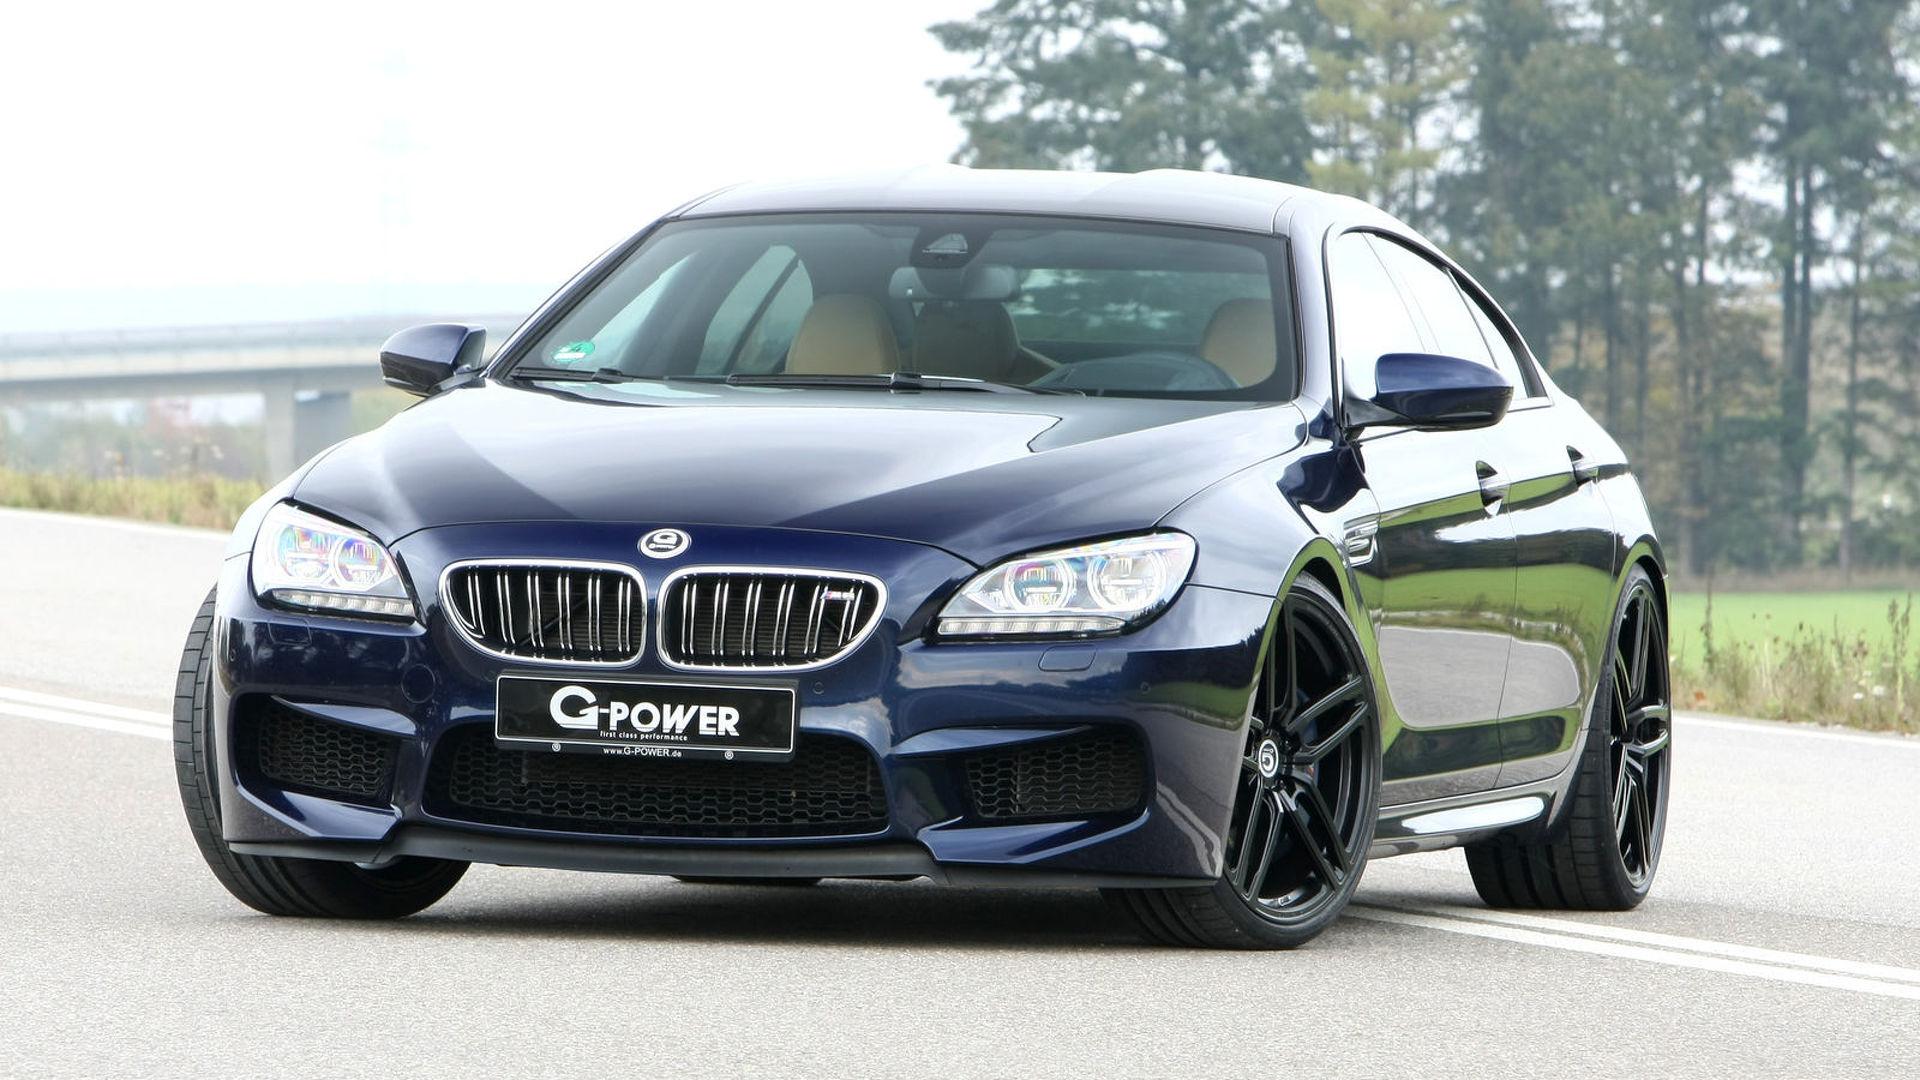 BMW M6 Gran Coupe >> Bmw M6 Gran Coupe News And Reviews Motor1 Com